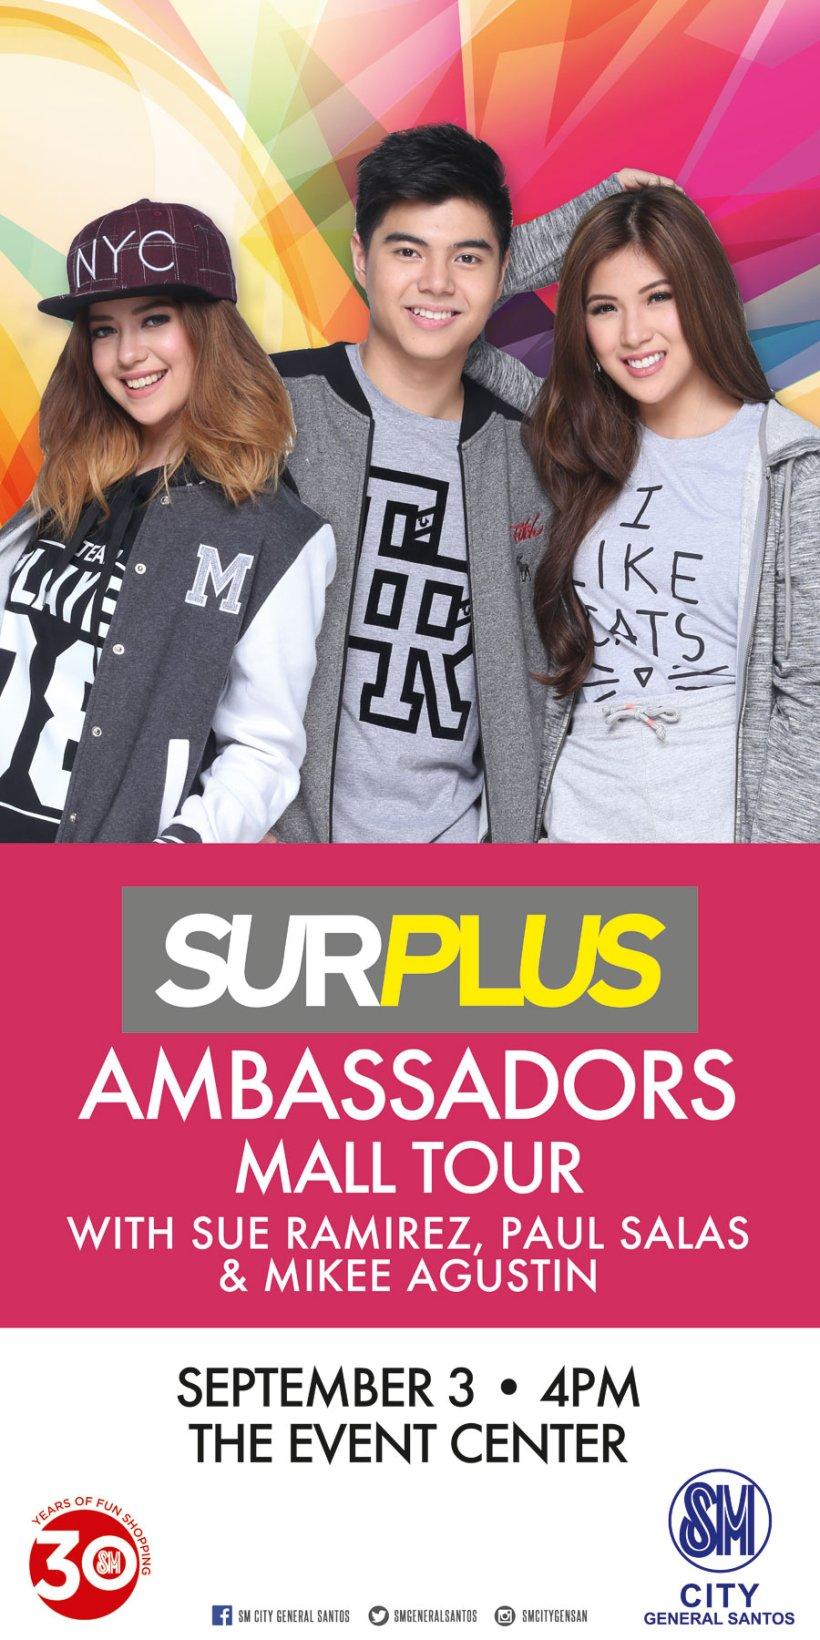 SURPLUS AMBASSADORS MALL TOUR